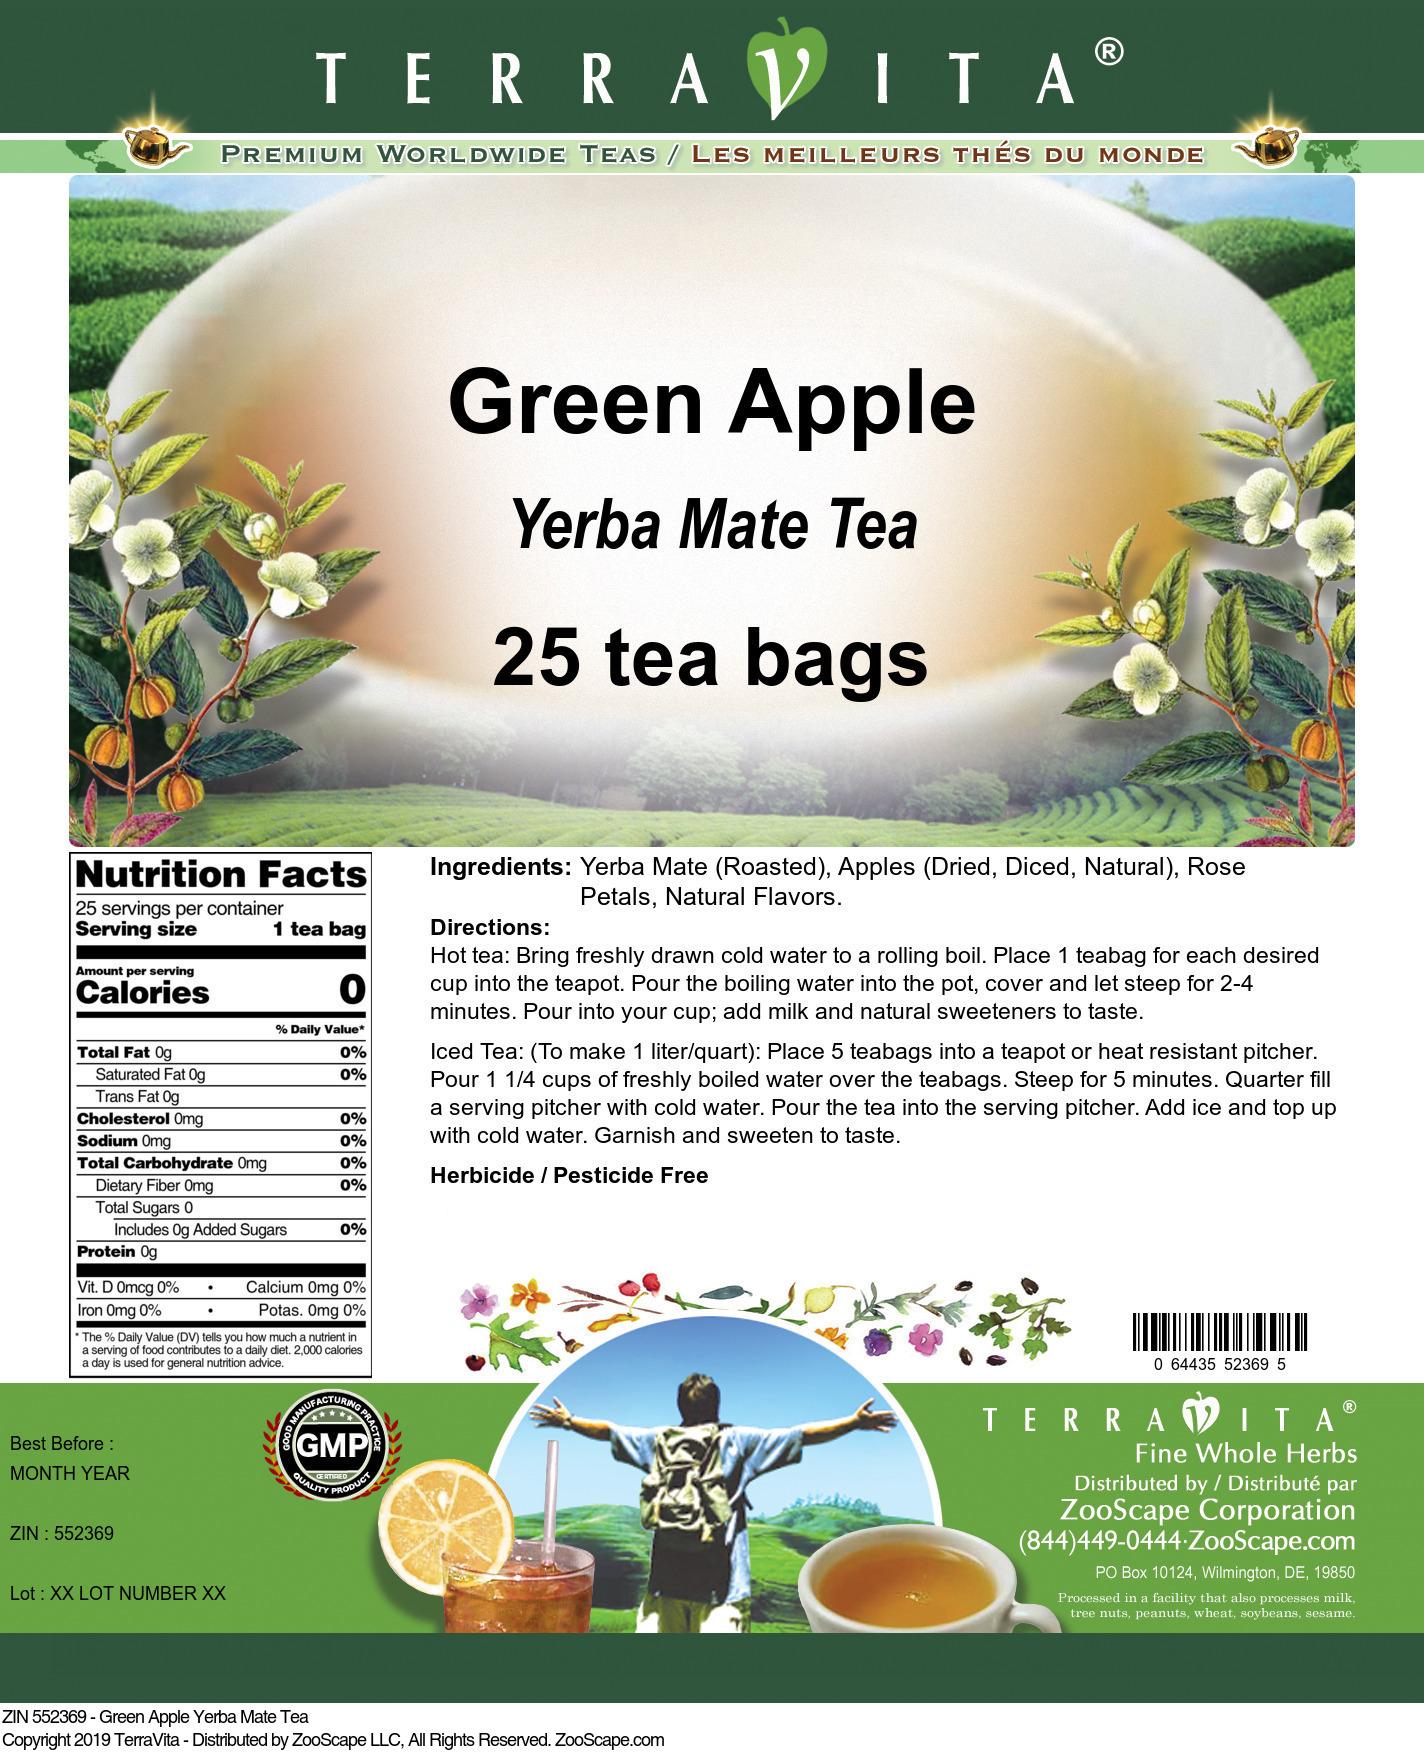 Green Apple Yerba Mate